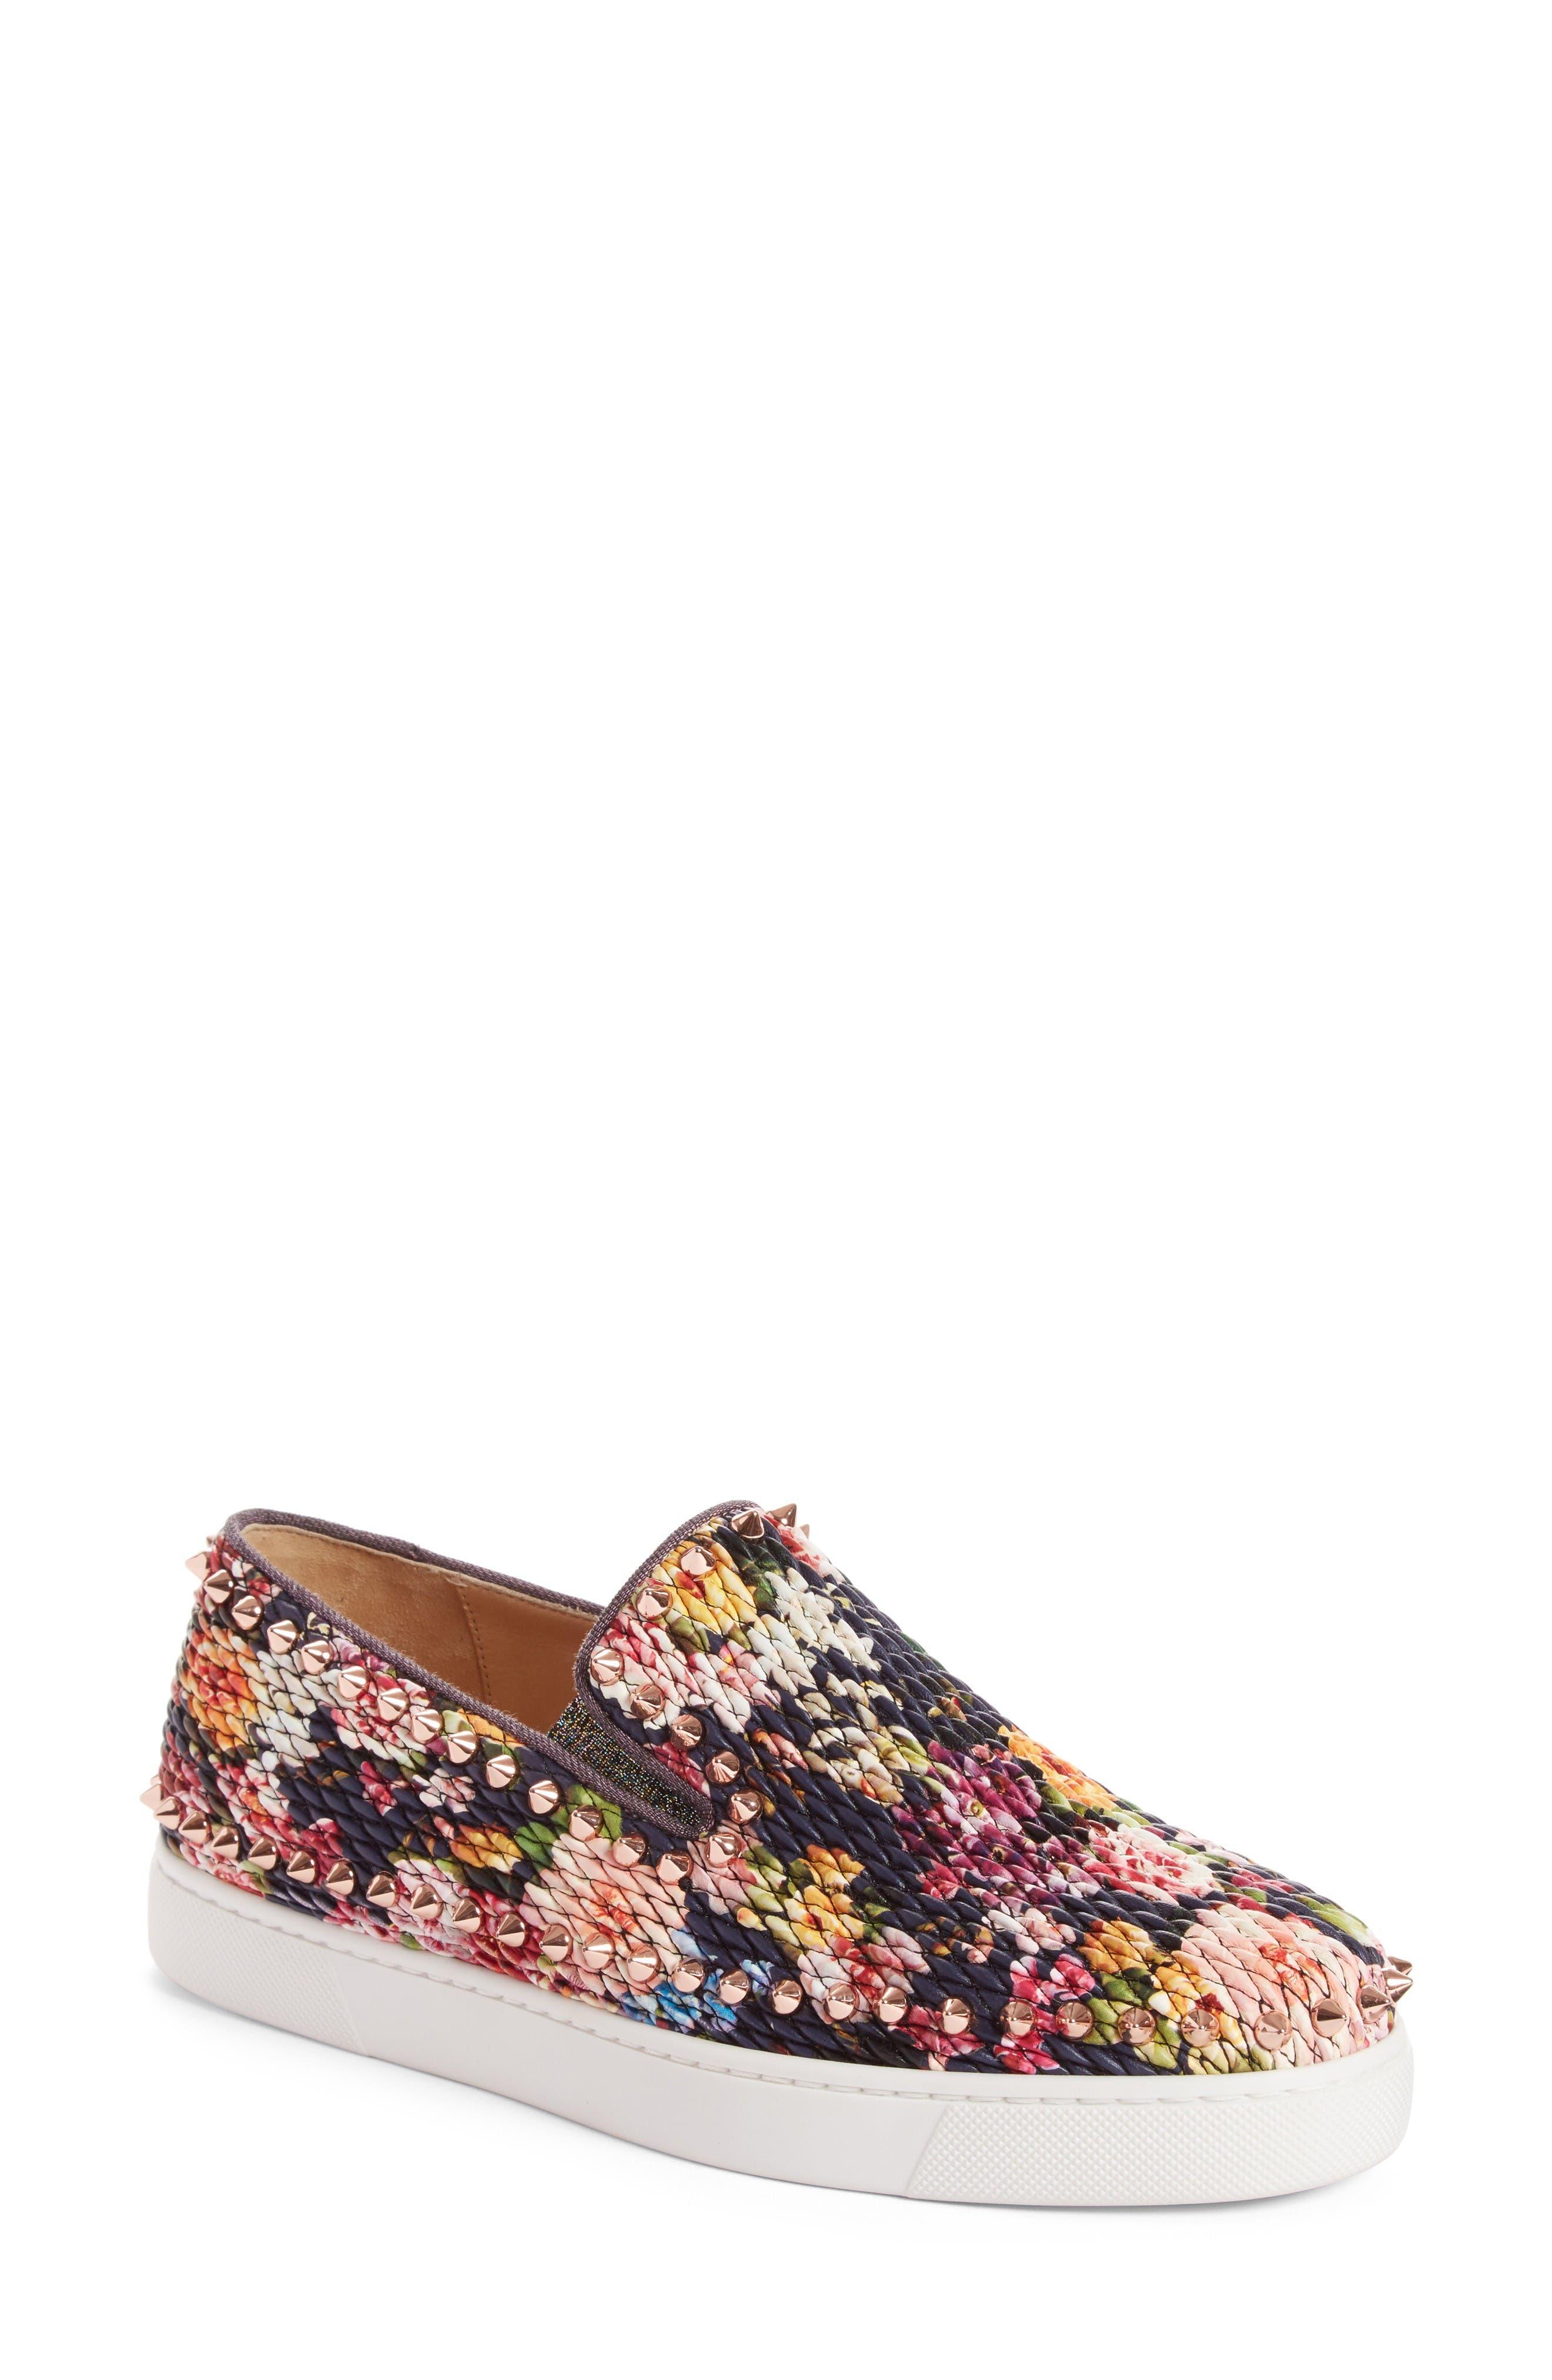 Christian Louboutin Pik Boat Floral Slip-On Sneaker (Women)